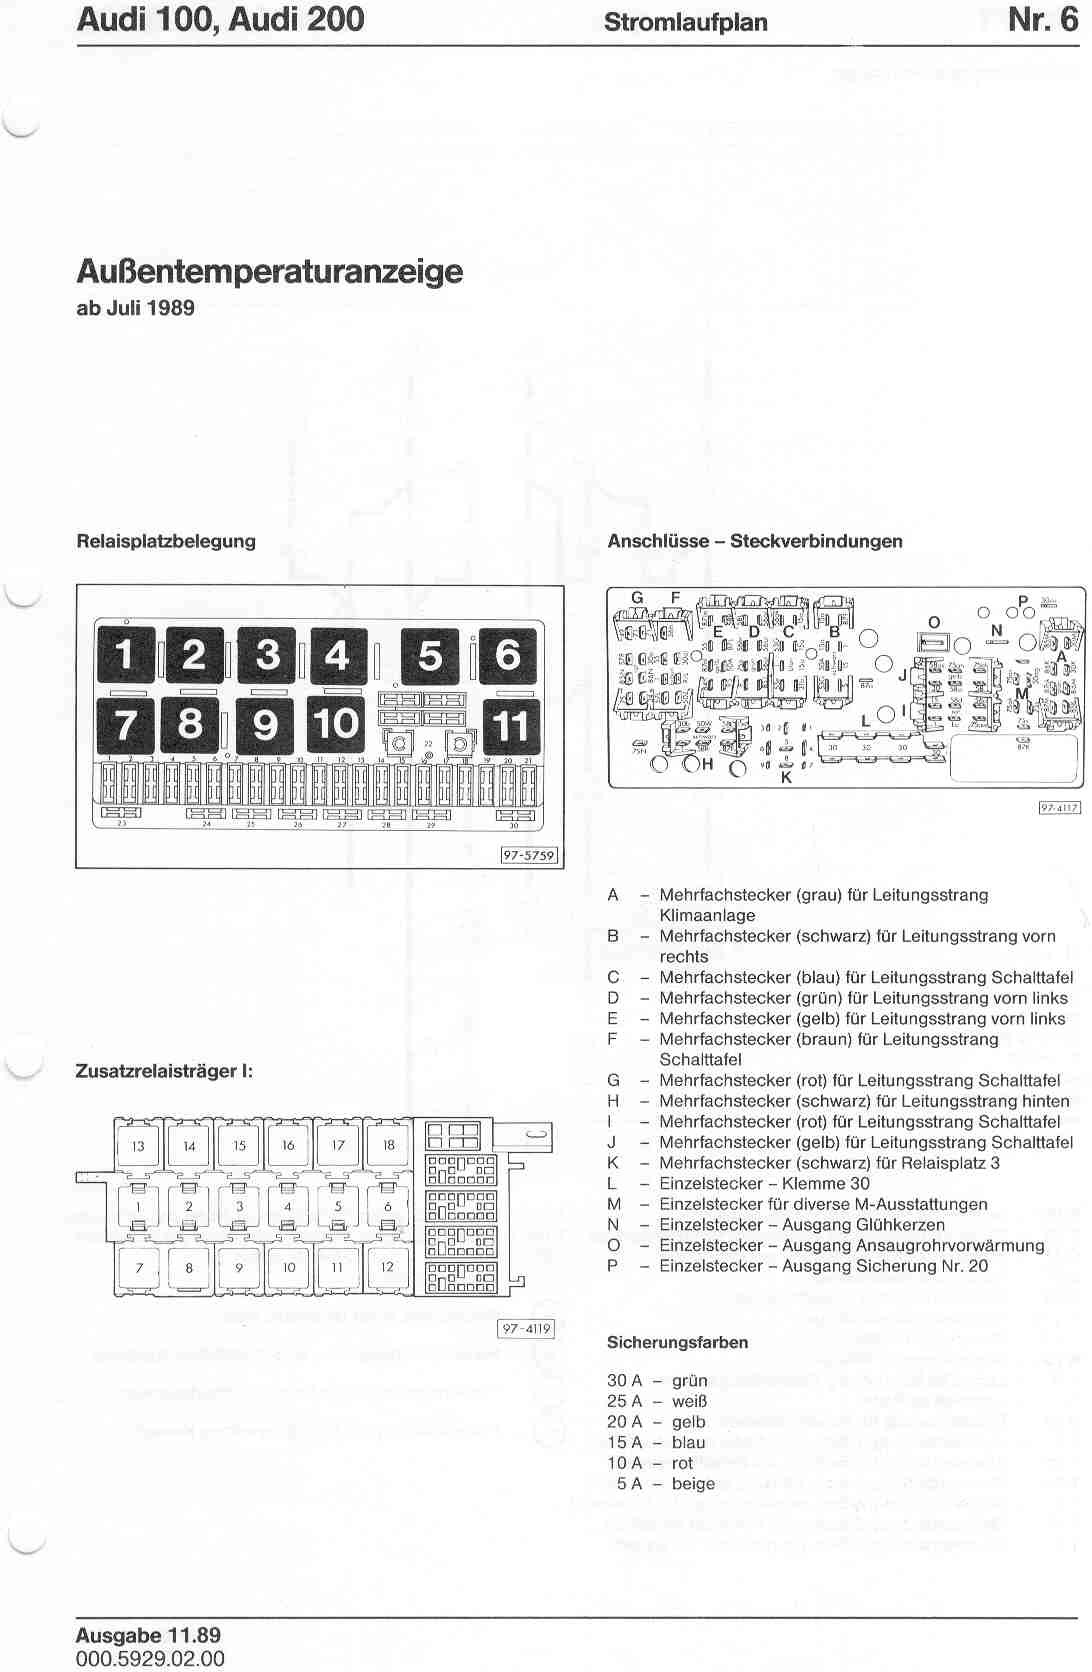 1984 Audi Quattro Wiring Diagram Electrical Diagrams 1989 4000 S Main Fuse Box 100 200 Factory 1986